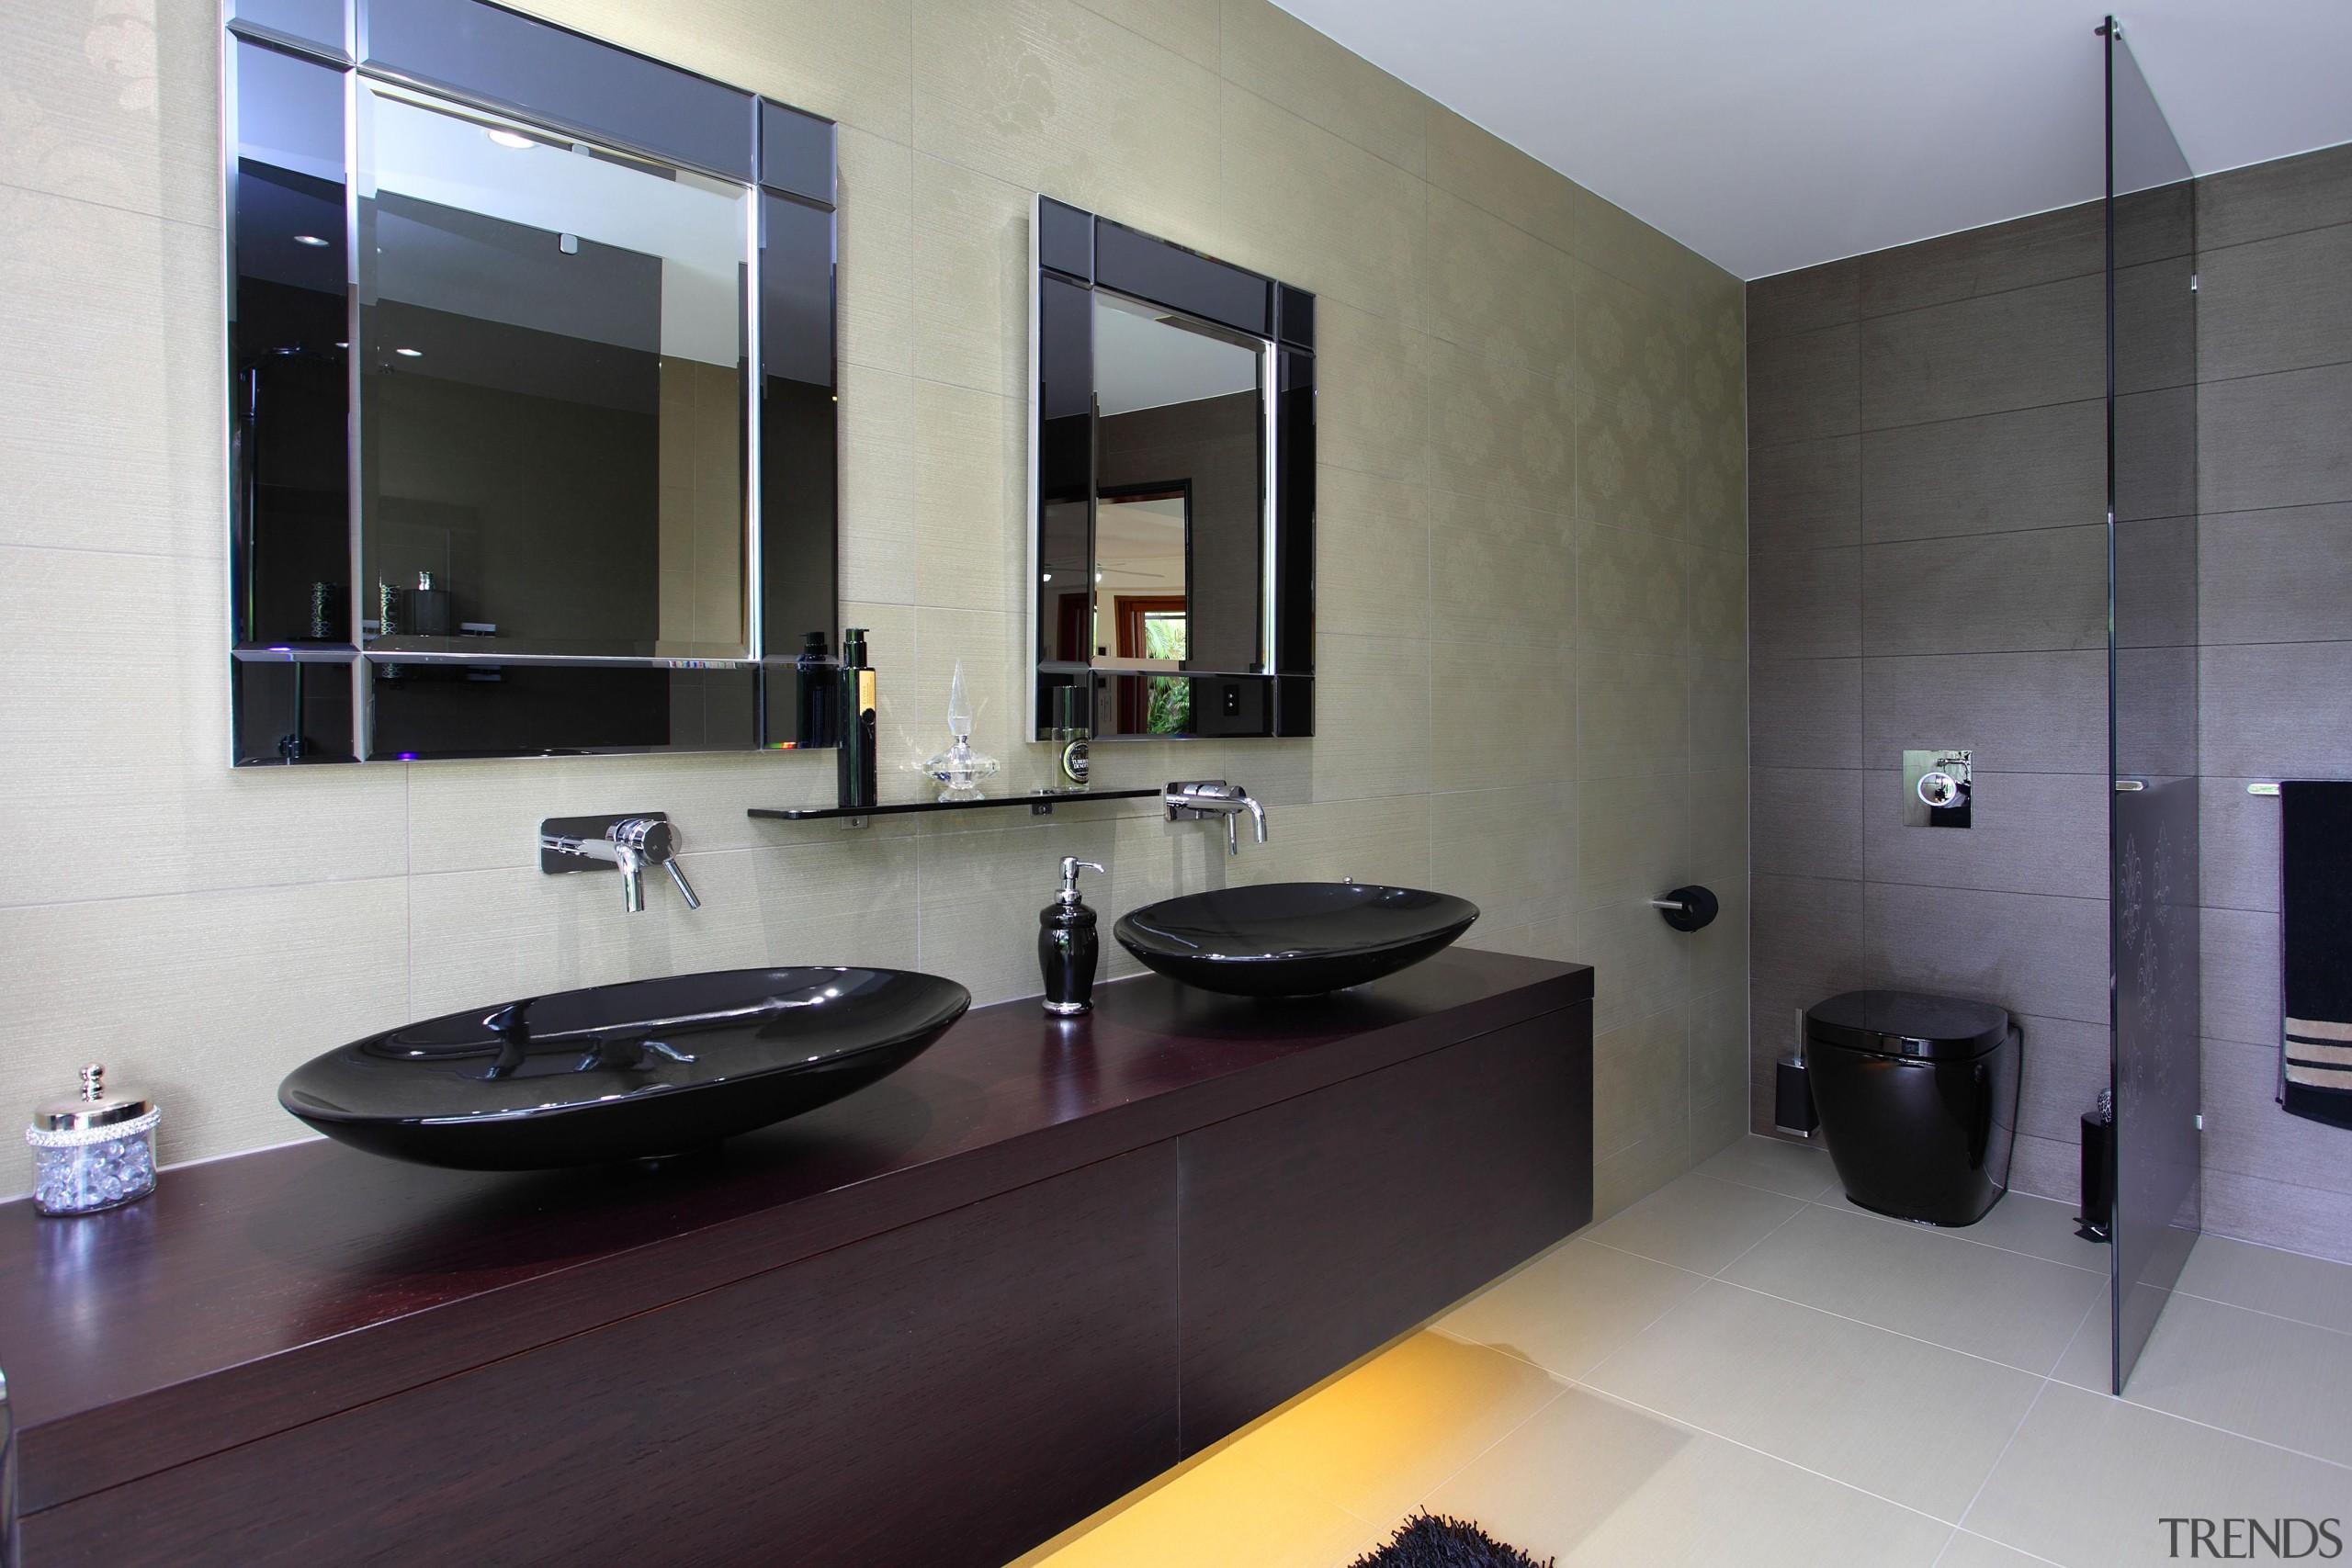 Winner Bathroom Design of the Year Queensland 2013 architecture, bathroom, floor, interior design, property, real estate, room, sink, gray, black